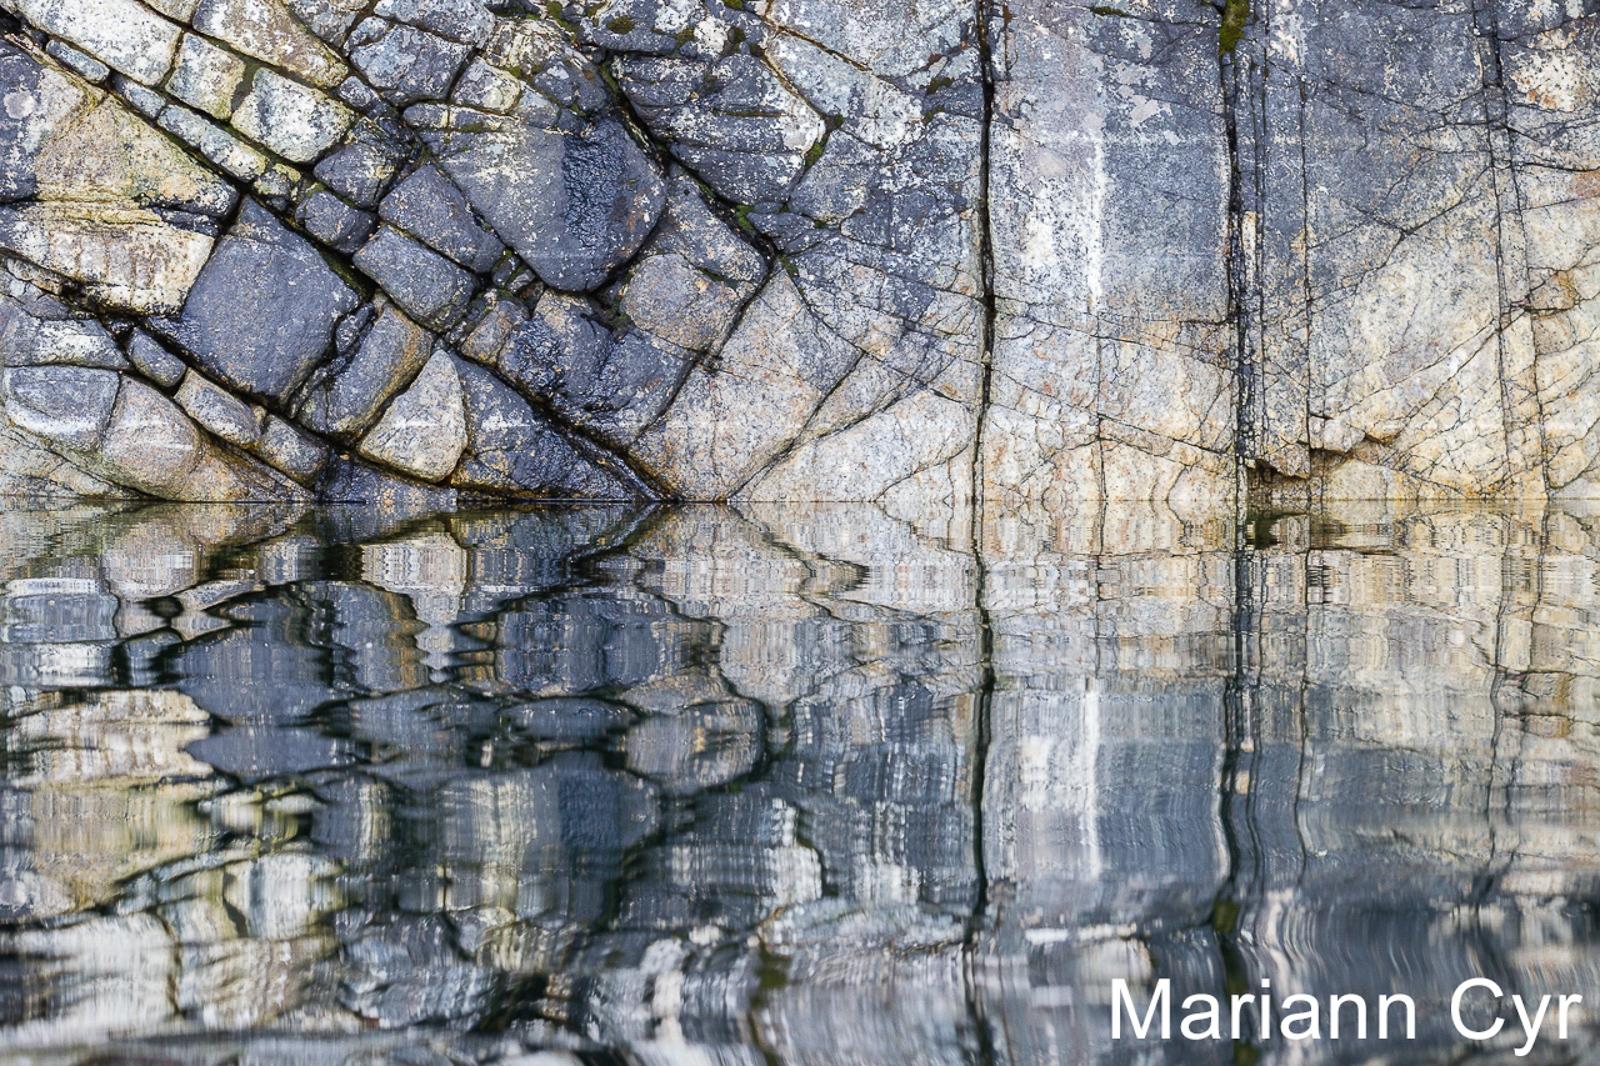 W3-16.Rock-Reflections